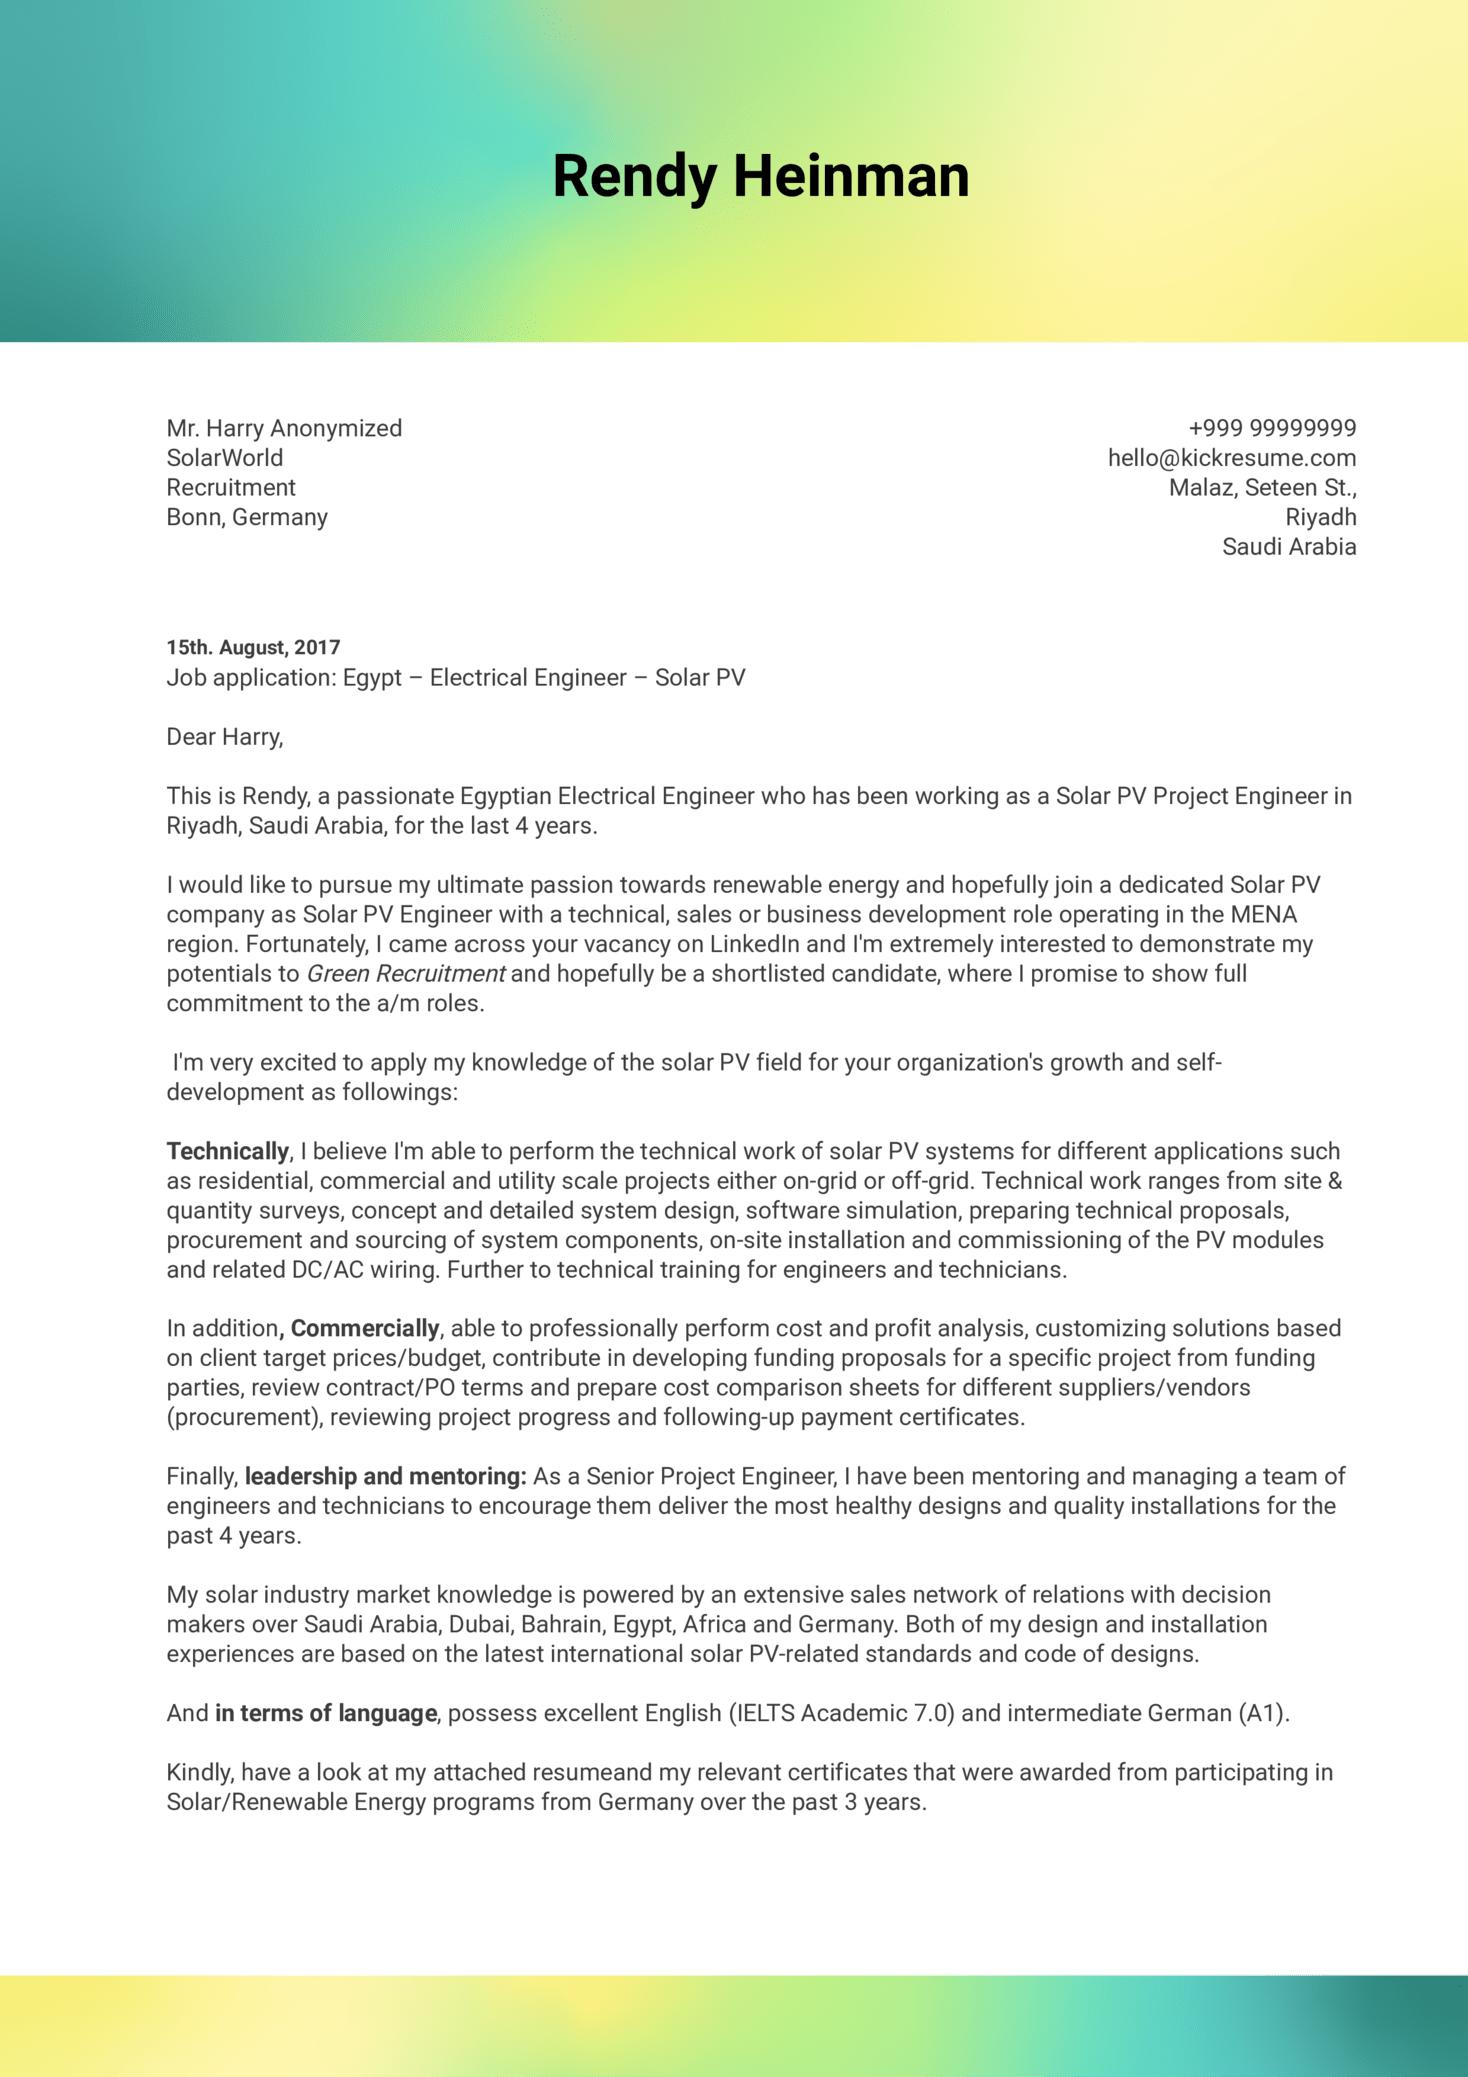 Business Development Engineer Cover Letter Sample (parte 1)